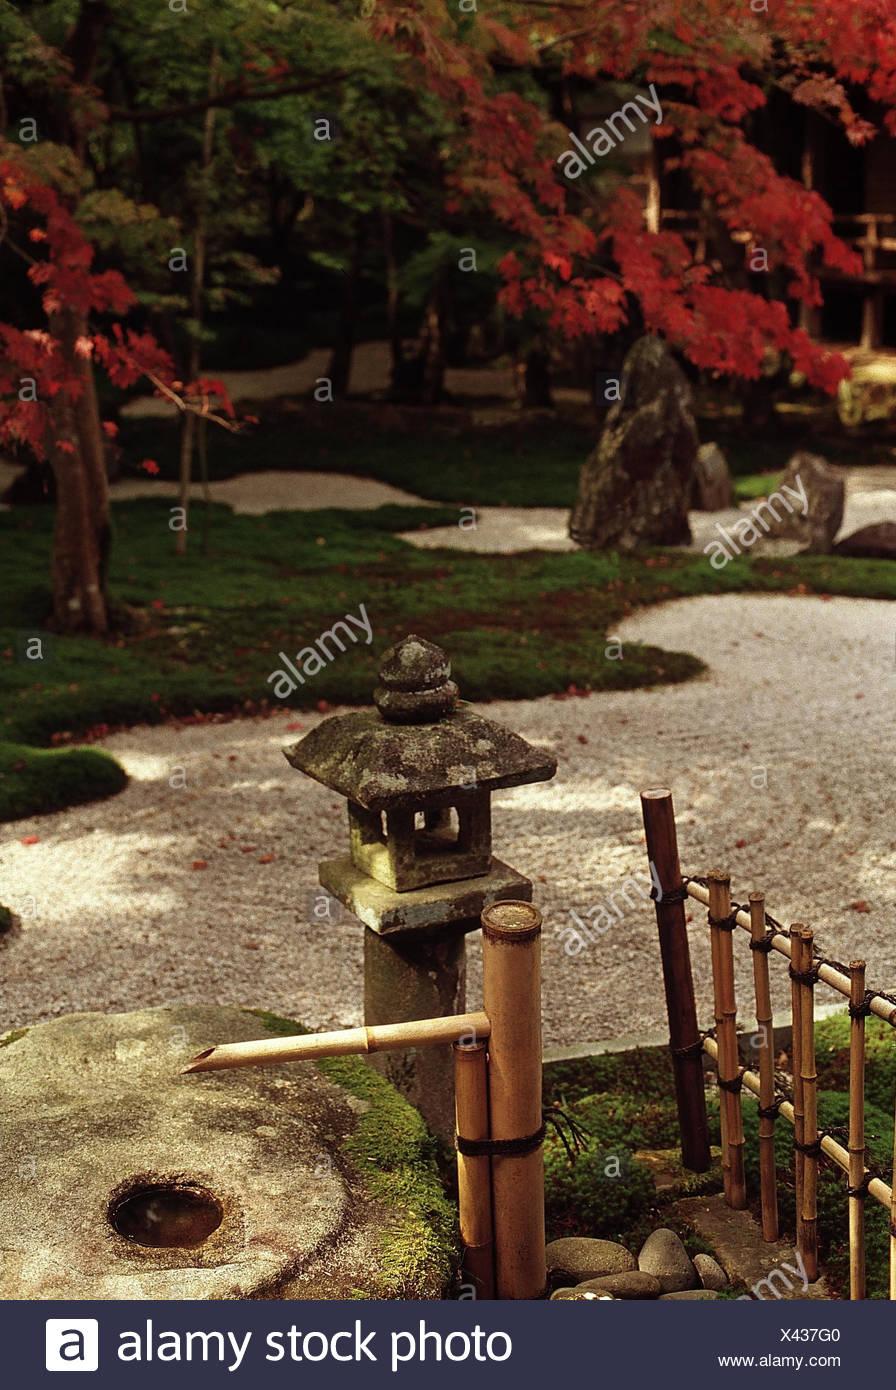 Japan, Kyushu, Dazaifu, Komiyo Ji Tempel, Ittekikaino Niwa Garten Innen